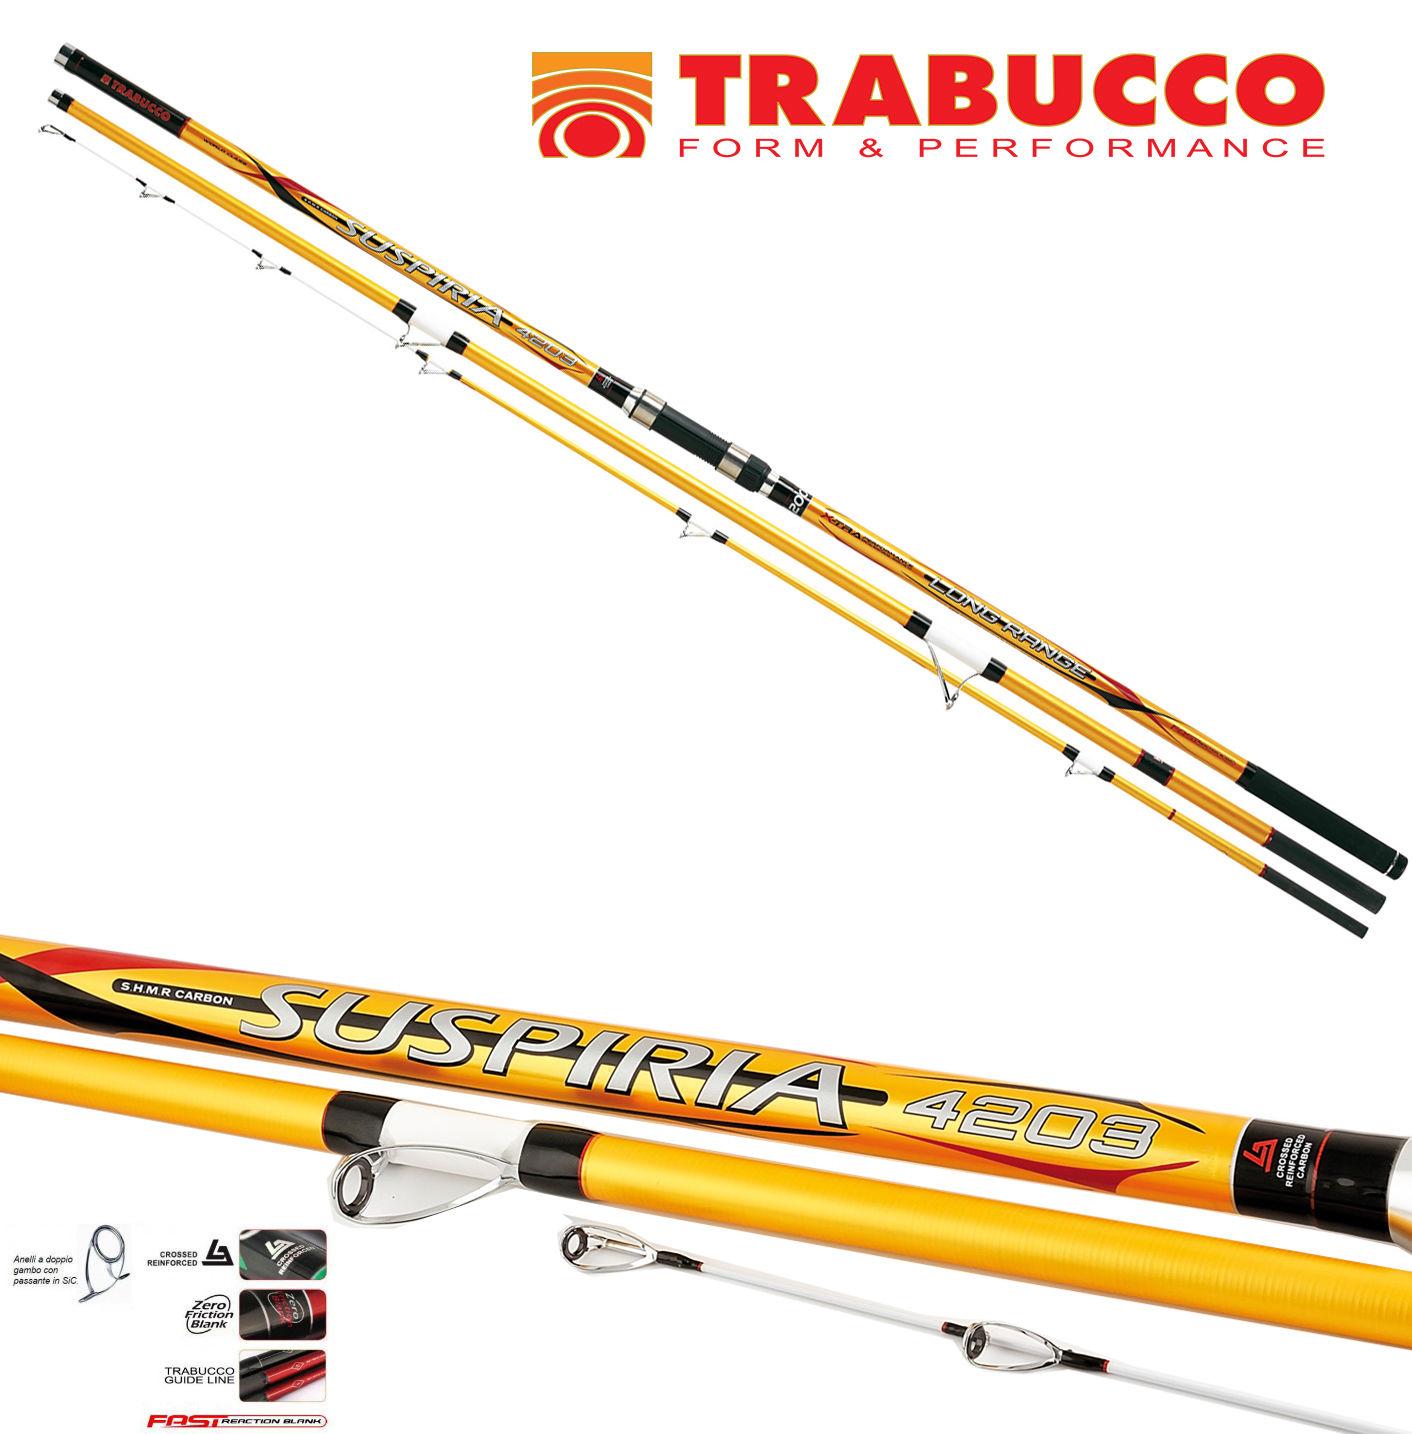 Trabucco suspiria 4203